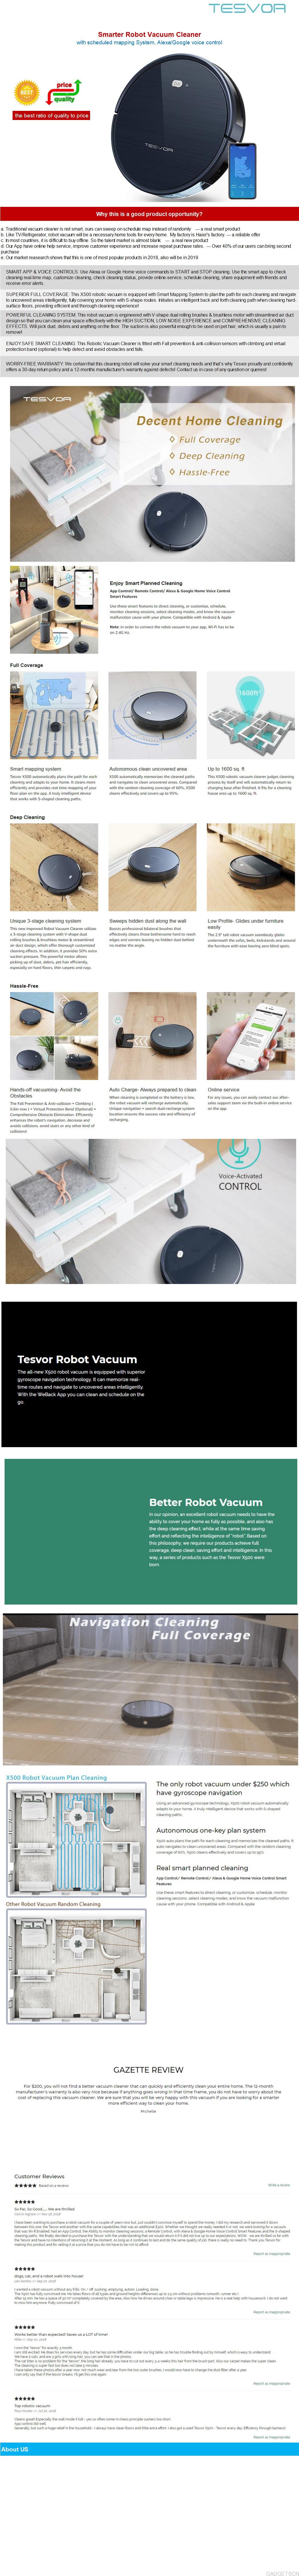 TESVOR office website,TESVOR Factory,TESVOR Manufacturer,TESVOR OEM Factory,TESVOR OEM Manufacturer,TESVOR brand website,TESVOR X500, robot vacuum cleaner,smart robot vacuum,floor cleaner,automatic sweeper,sweeping robot,iRobot factory,Roborock factory,eufy factory,iLife factory,Ecovacs factory,Saugroboter,Intelligenter Kehrroboter,Staubsauger